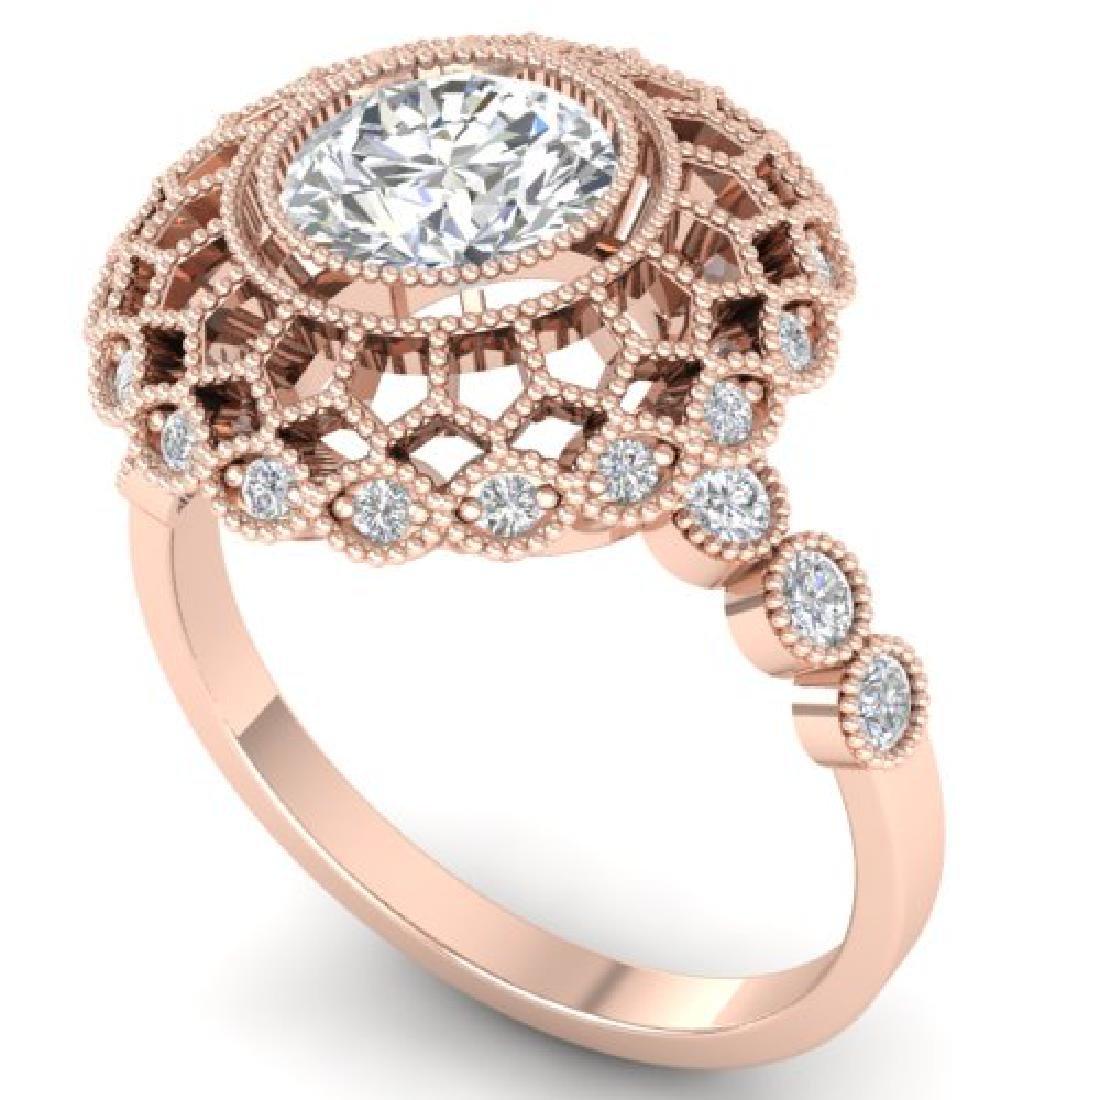 1.5 CTW Certified VS/SI Diamond Art Deco Ring 18K Rose - 2